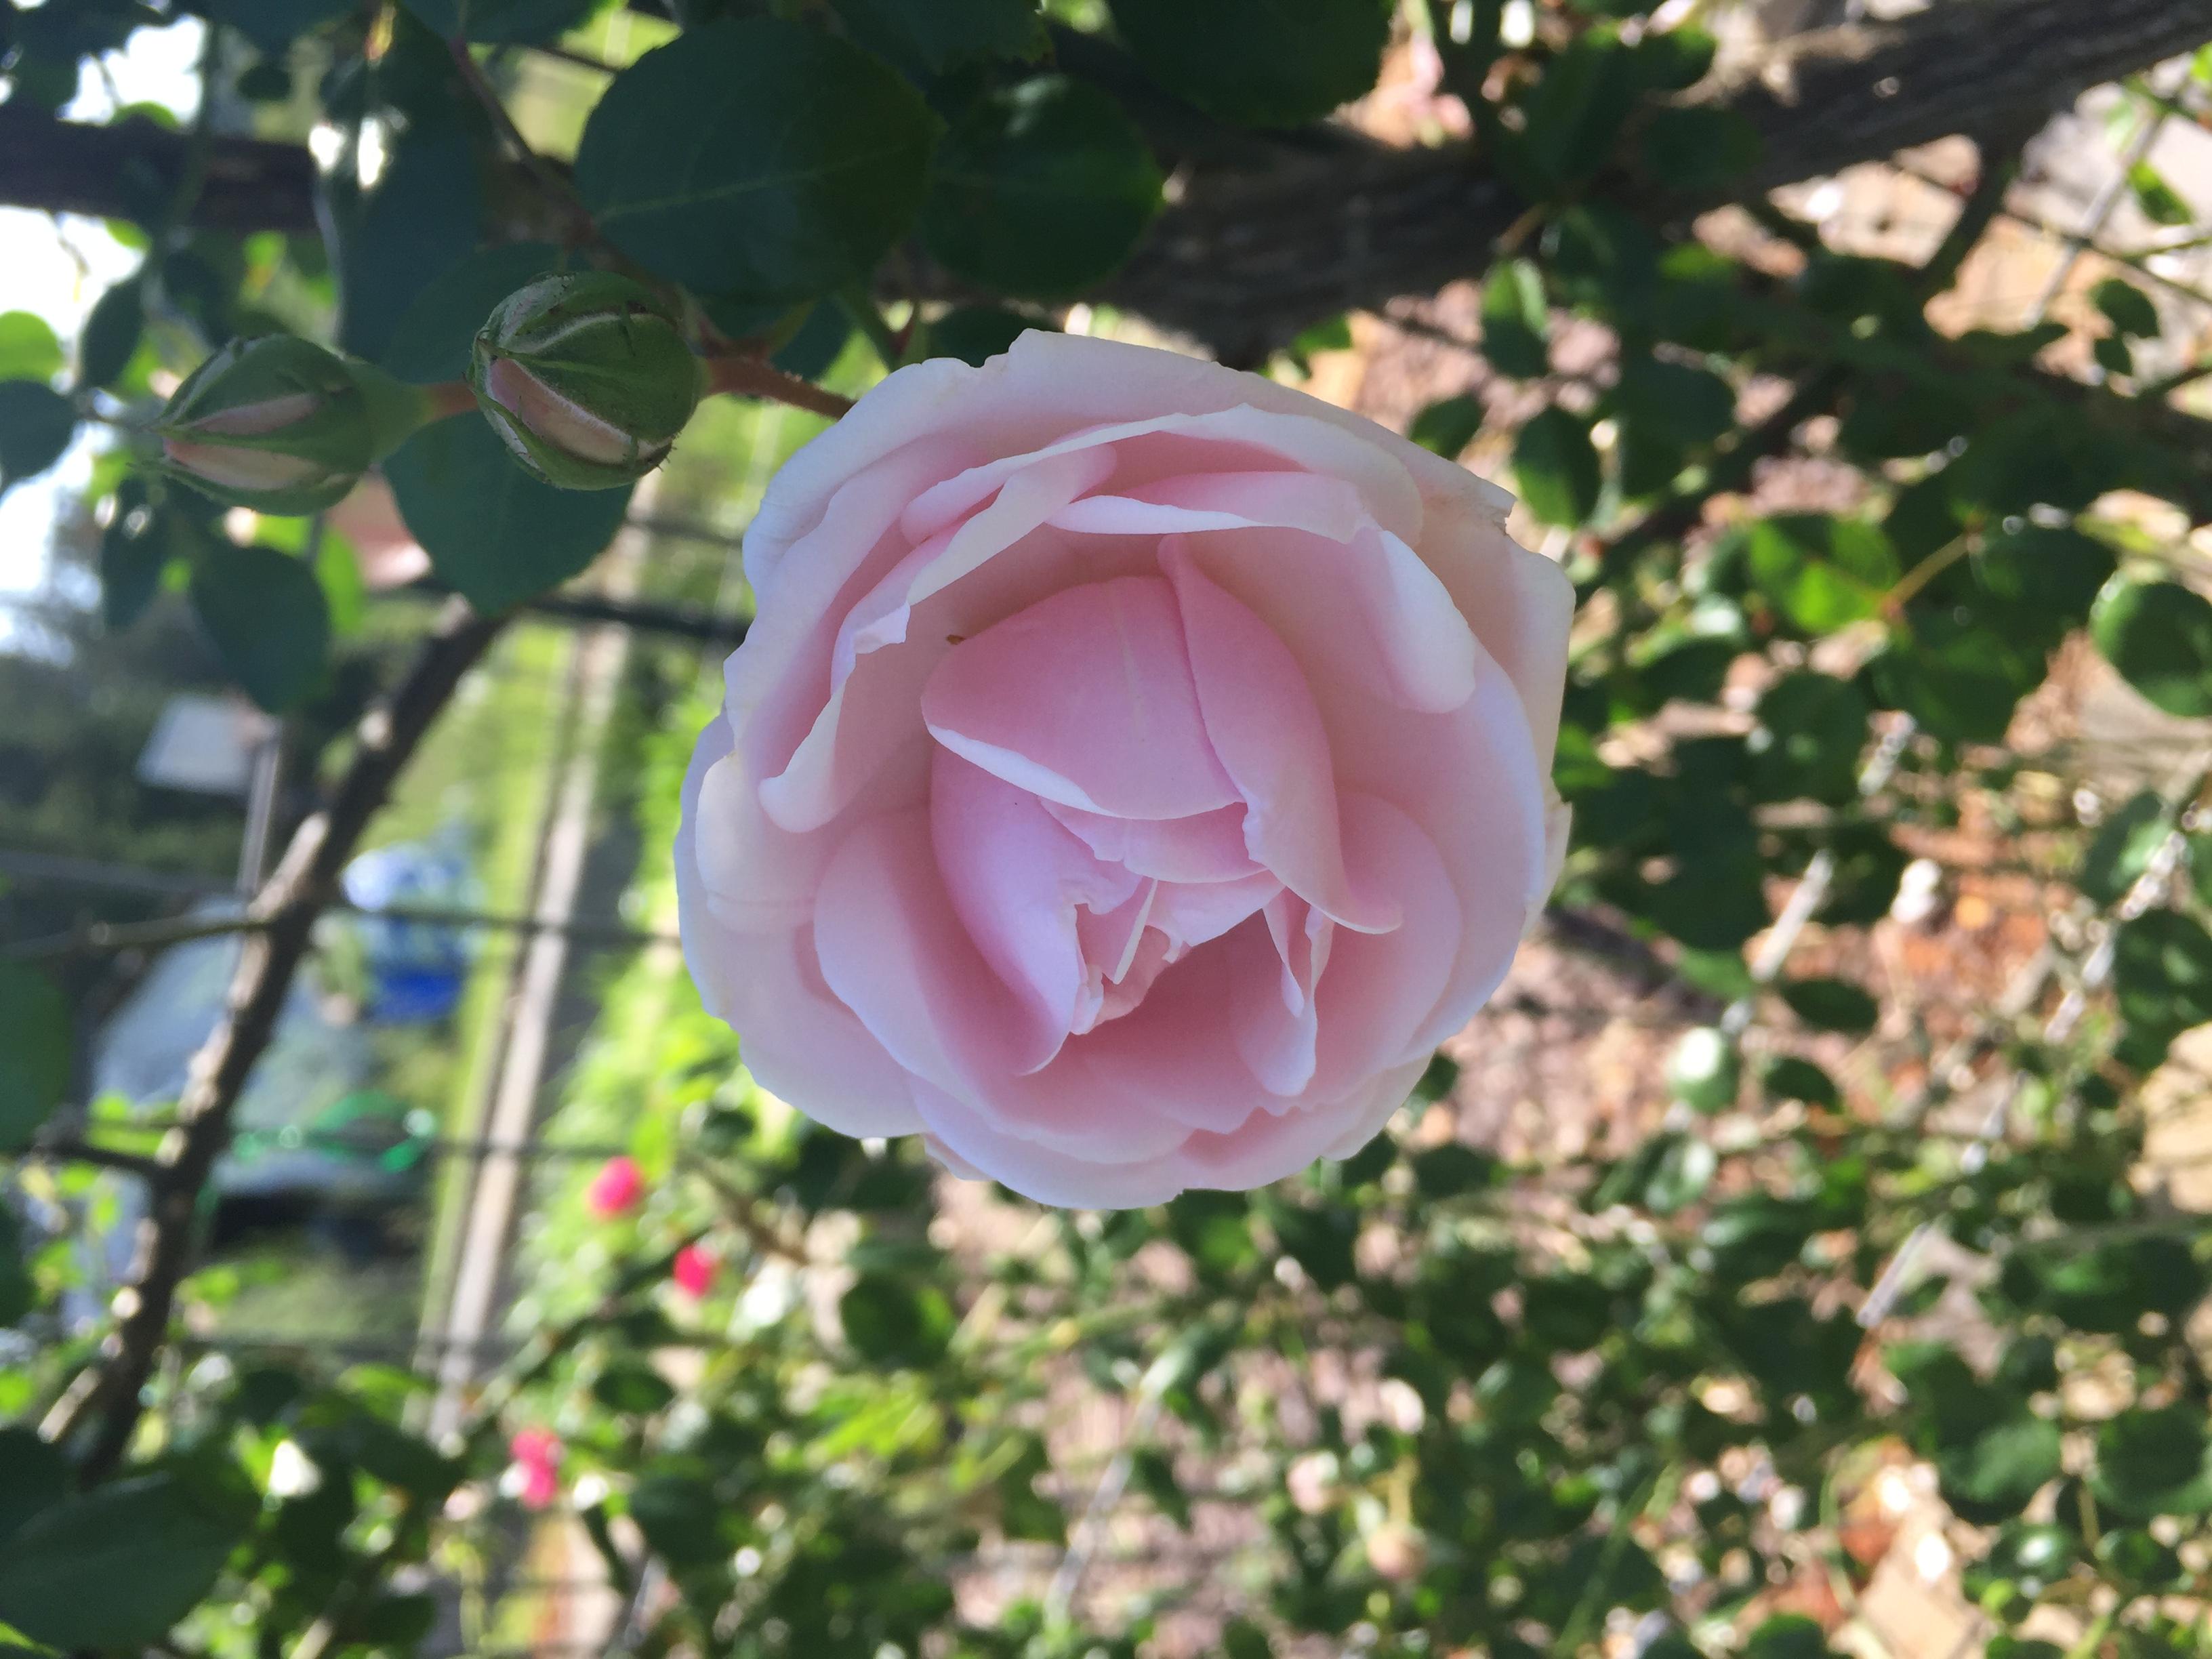 41E6B082 12A6 430D A839 AB06D8389603 Roses in full bloom!